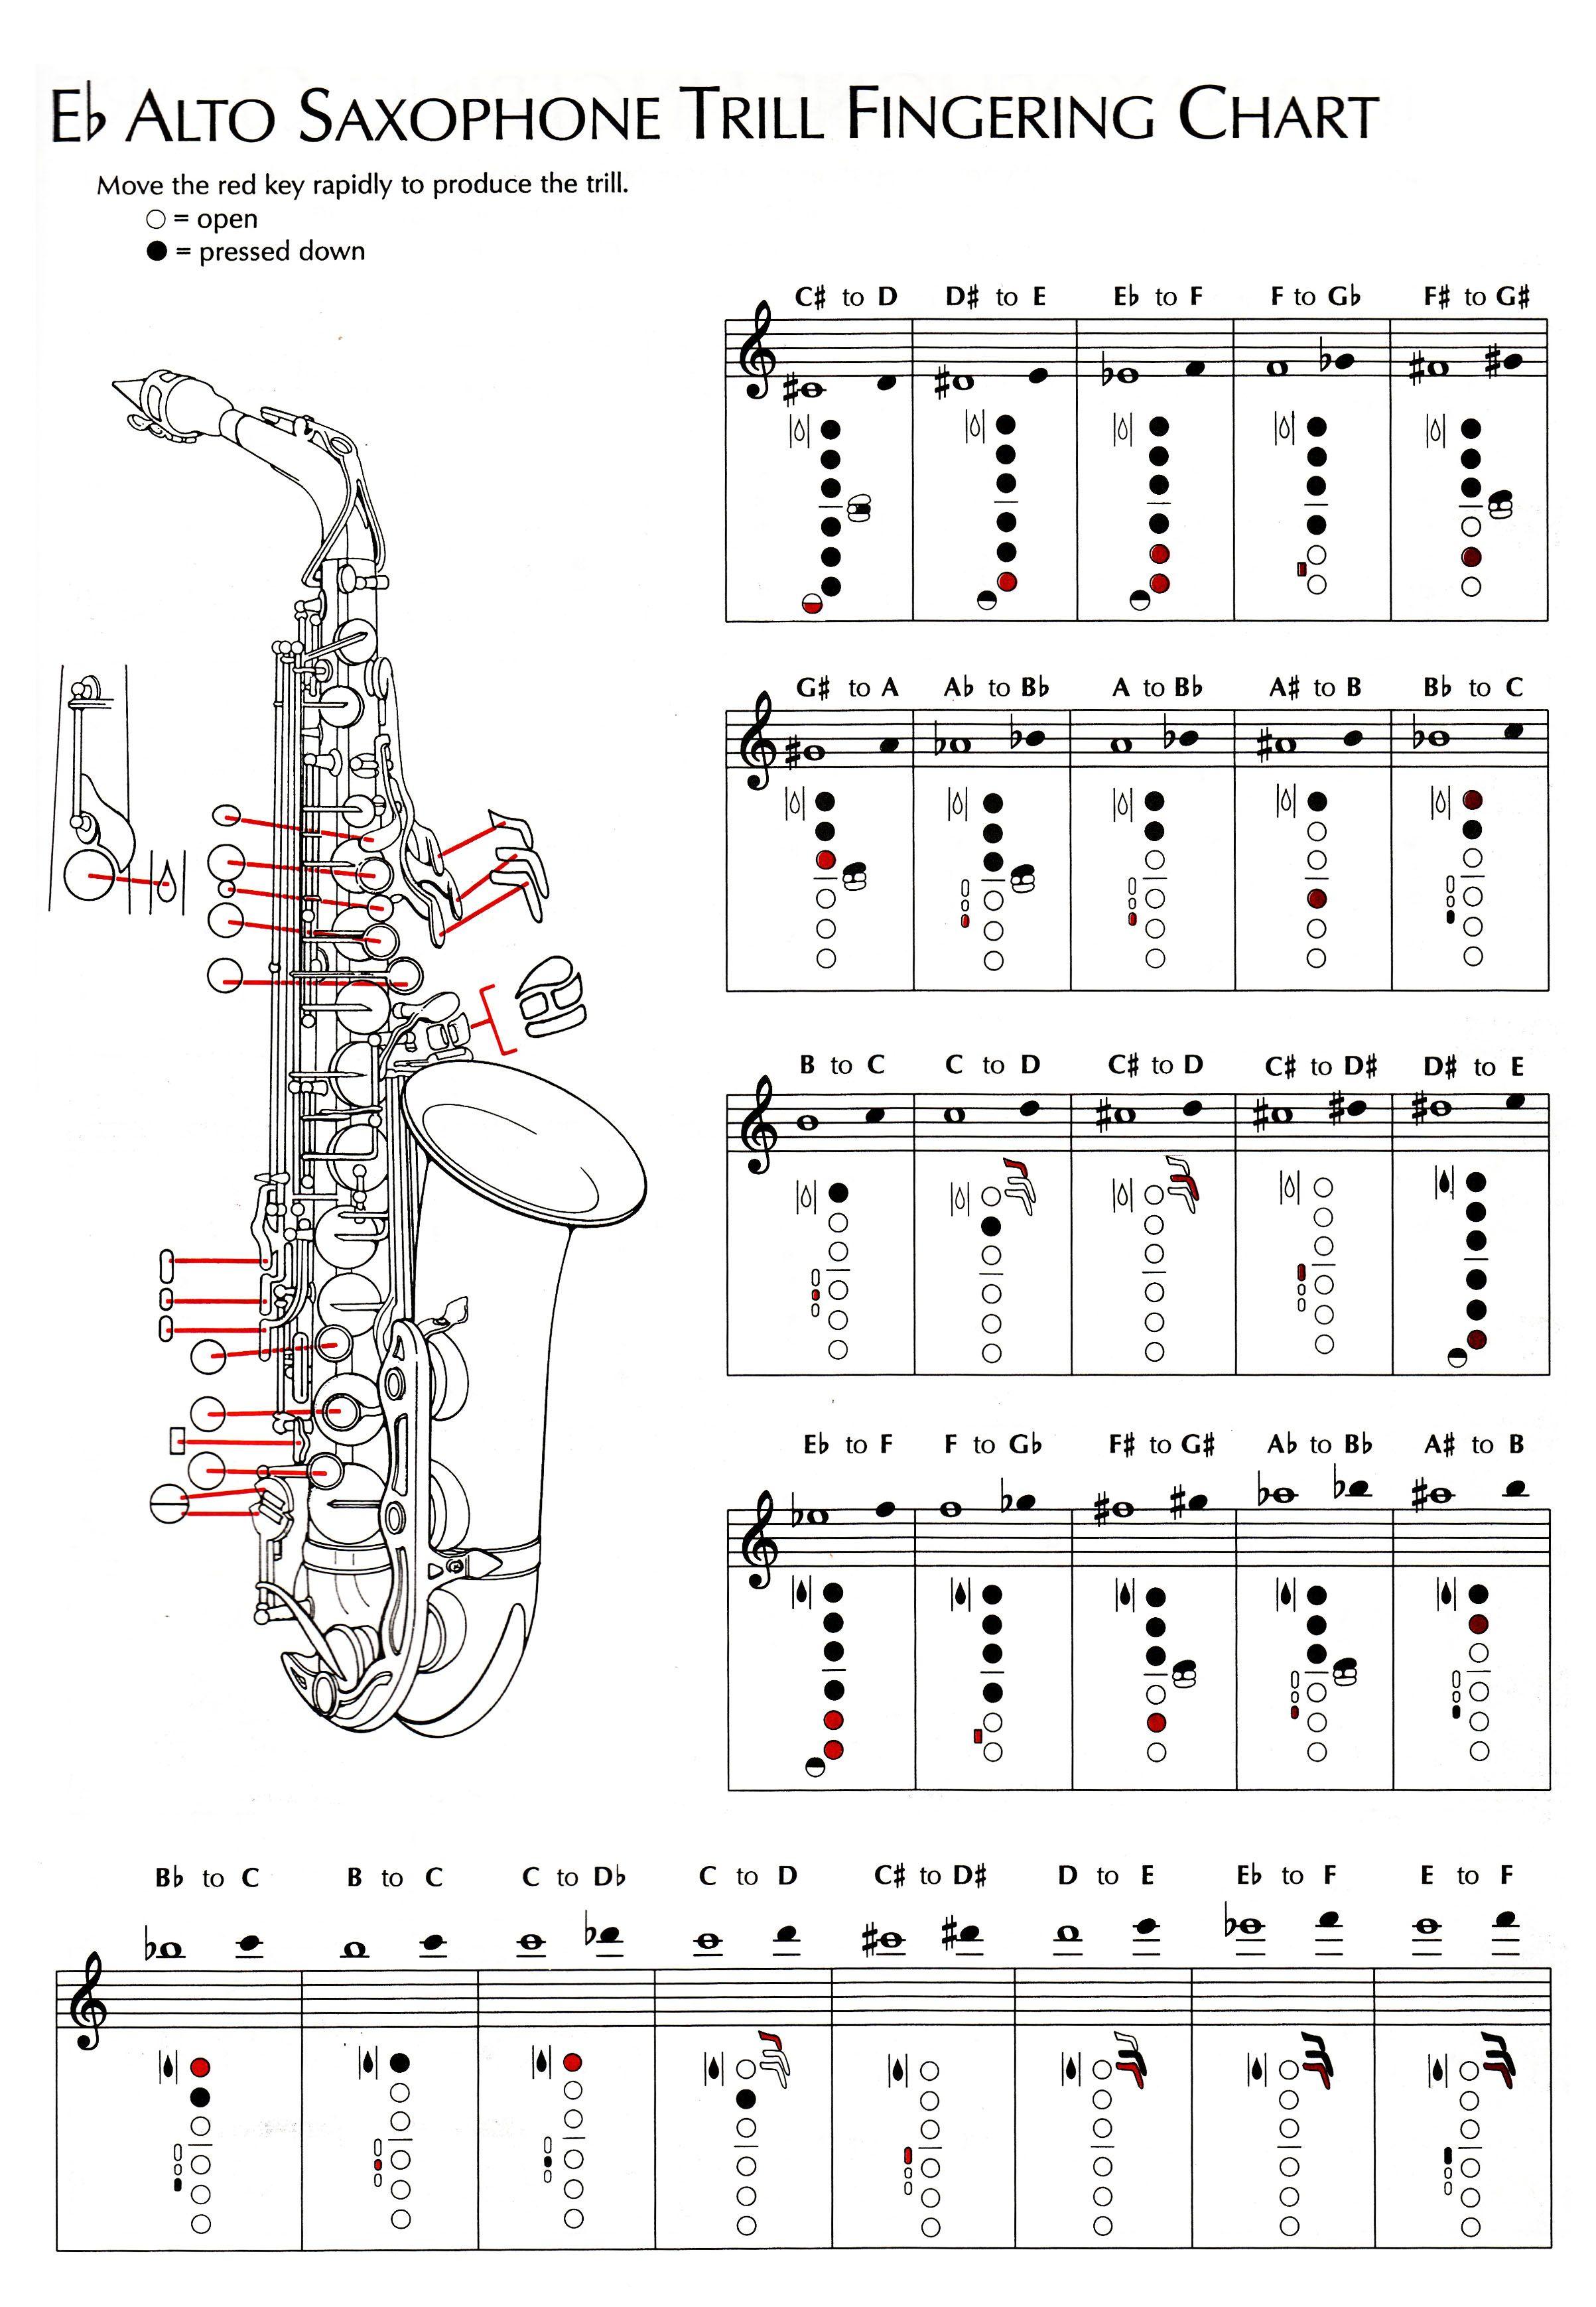 Alto Saxophone Keys Chart Instrument fingering bchartsb – Saxophone Fingering Chart